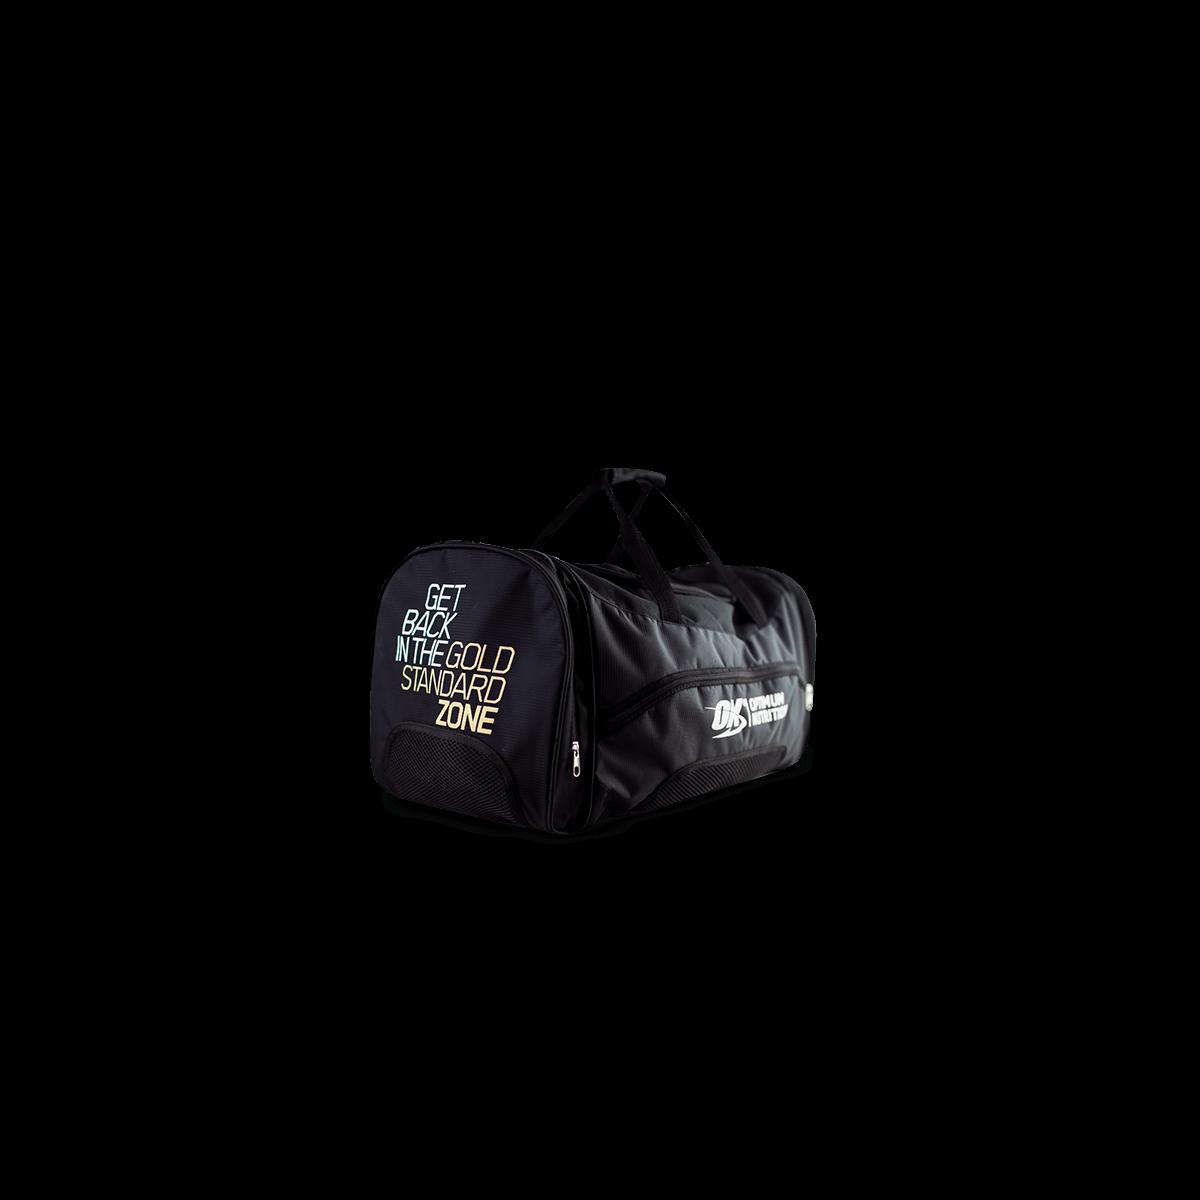 ON Gear Bag